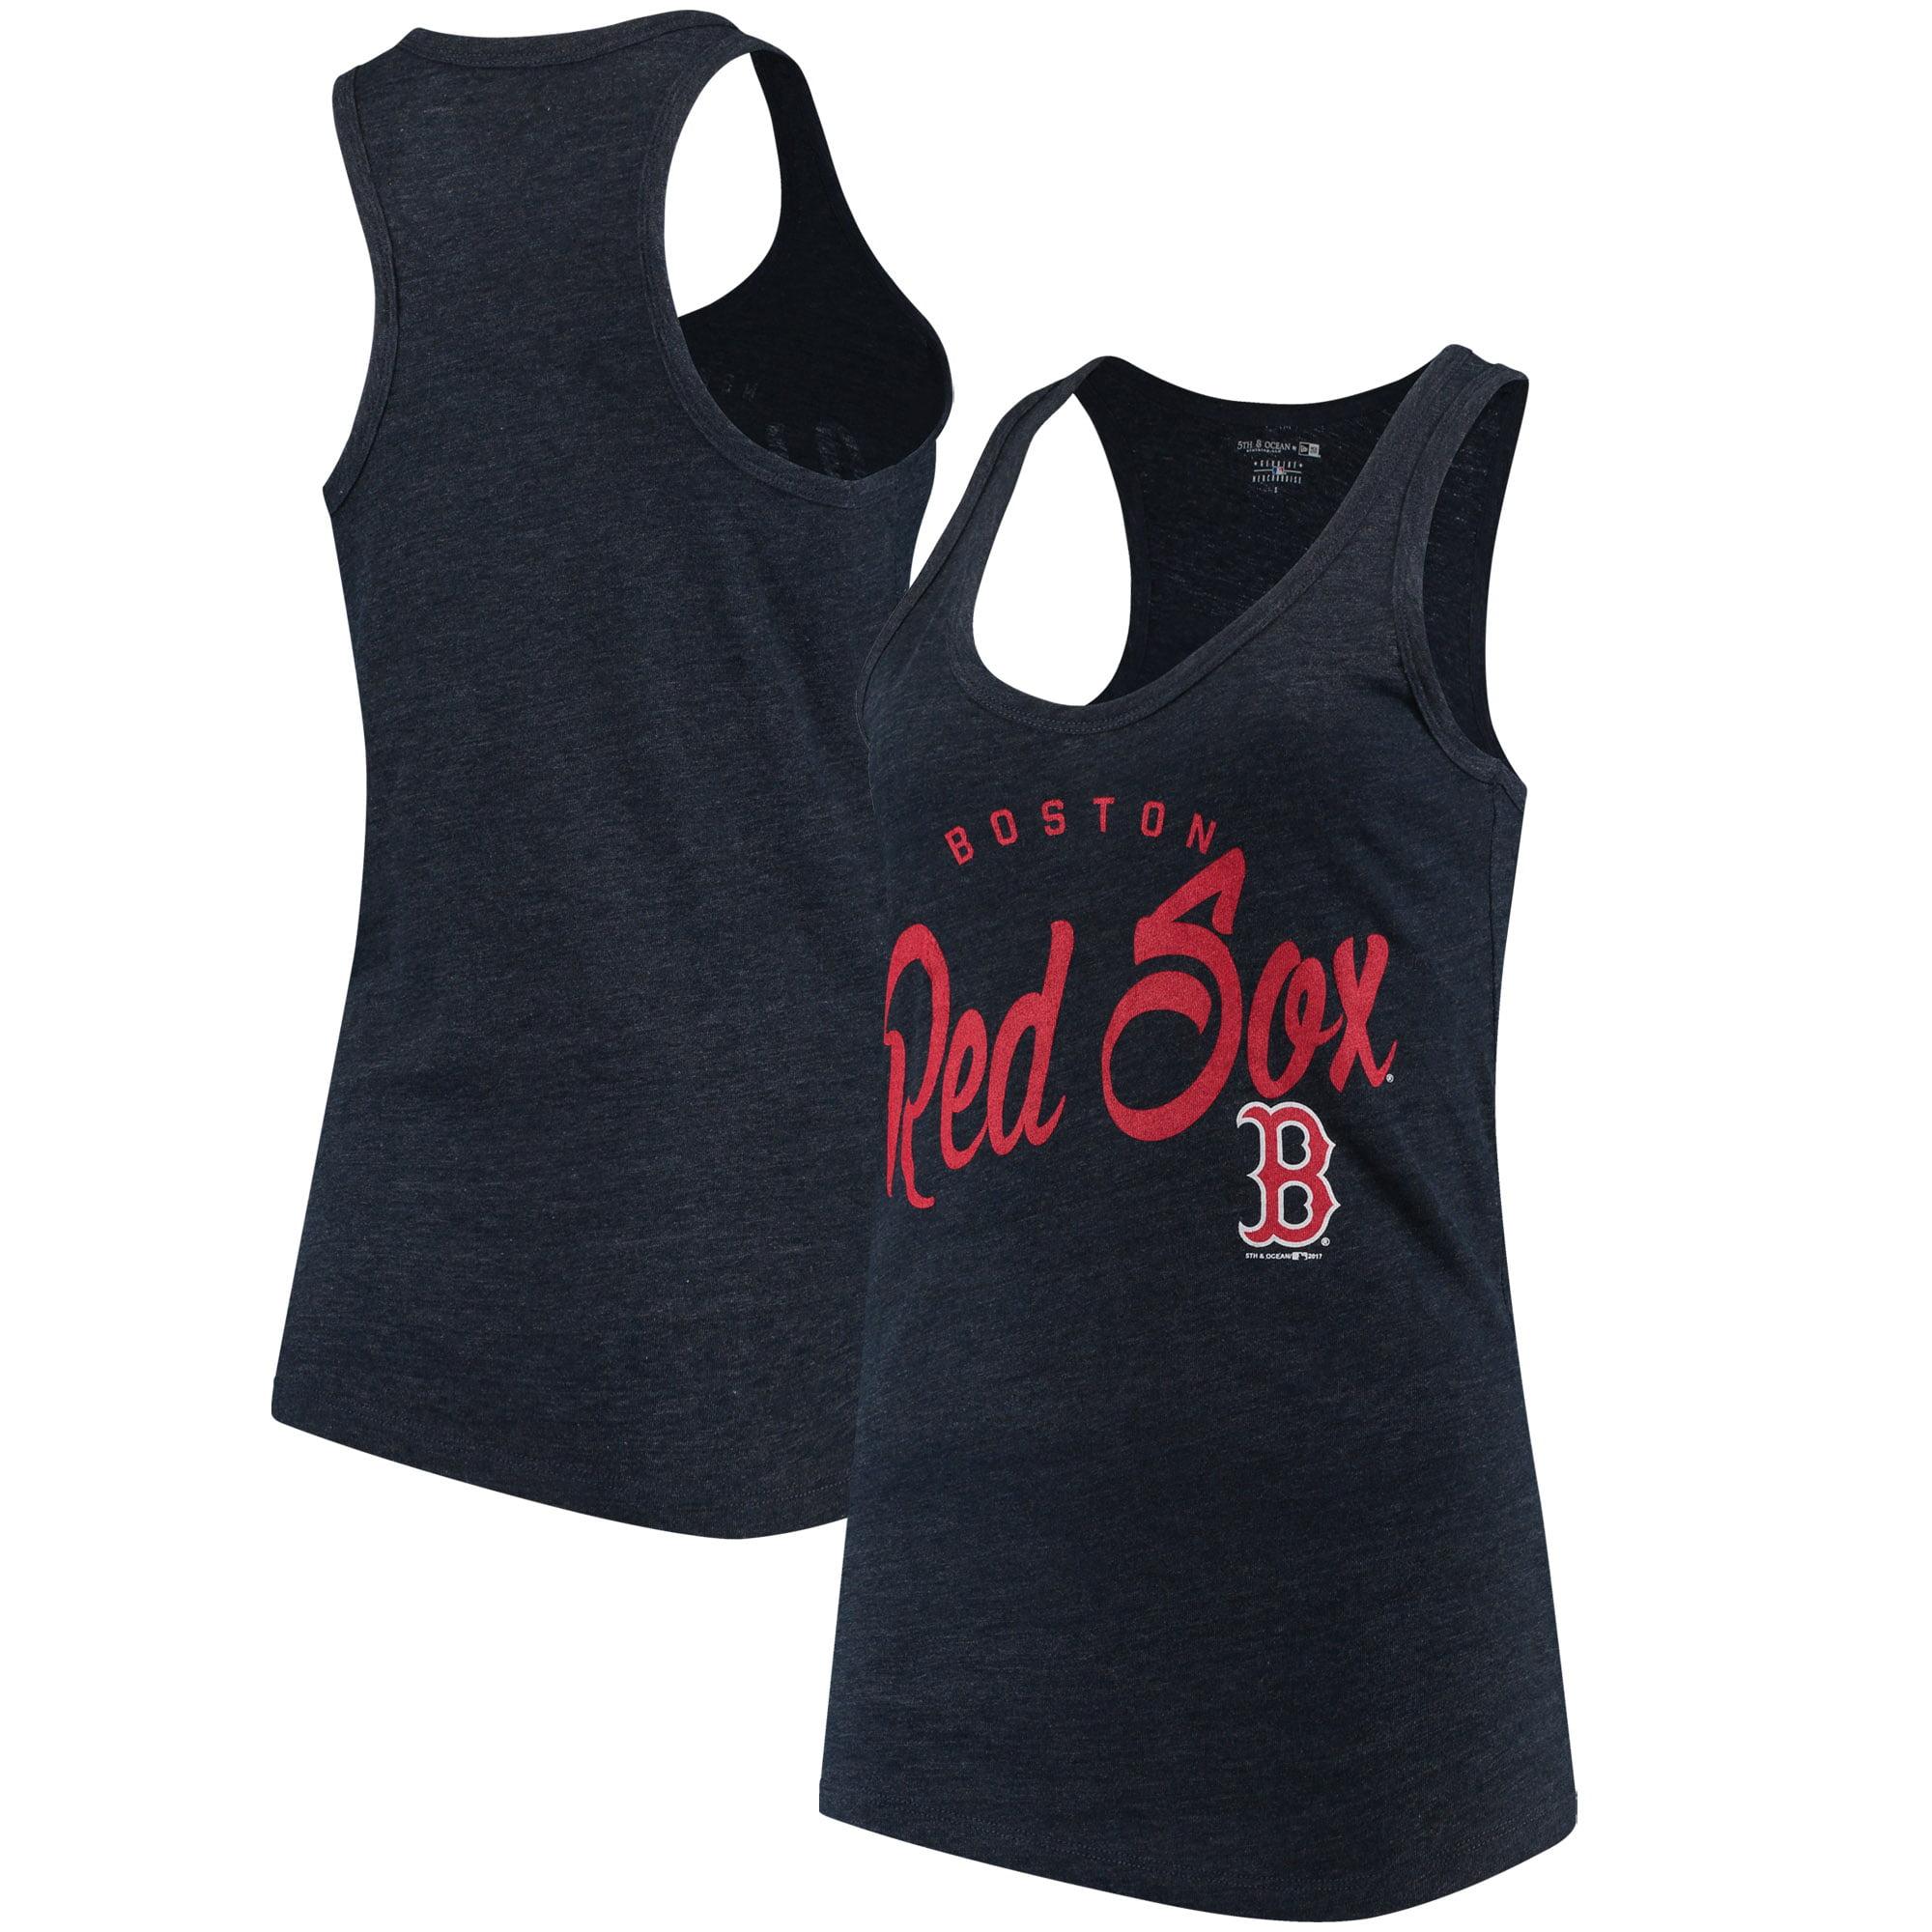 Boston Red Sox 5th & Ocean by New Era Women's Tri-Blend Racerback Tank Top - Navy